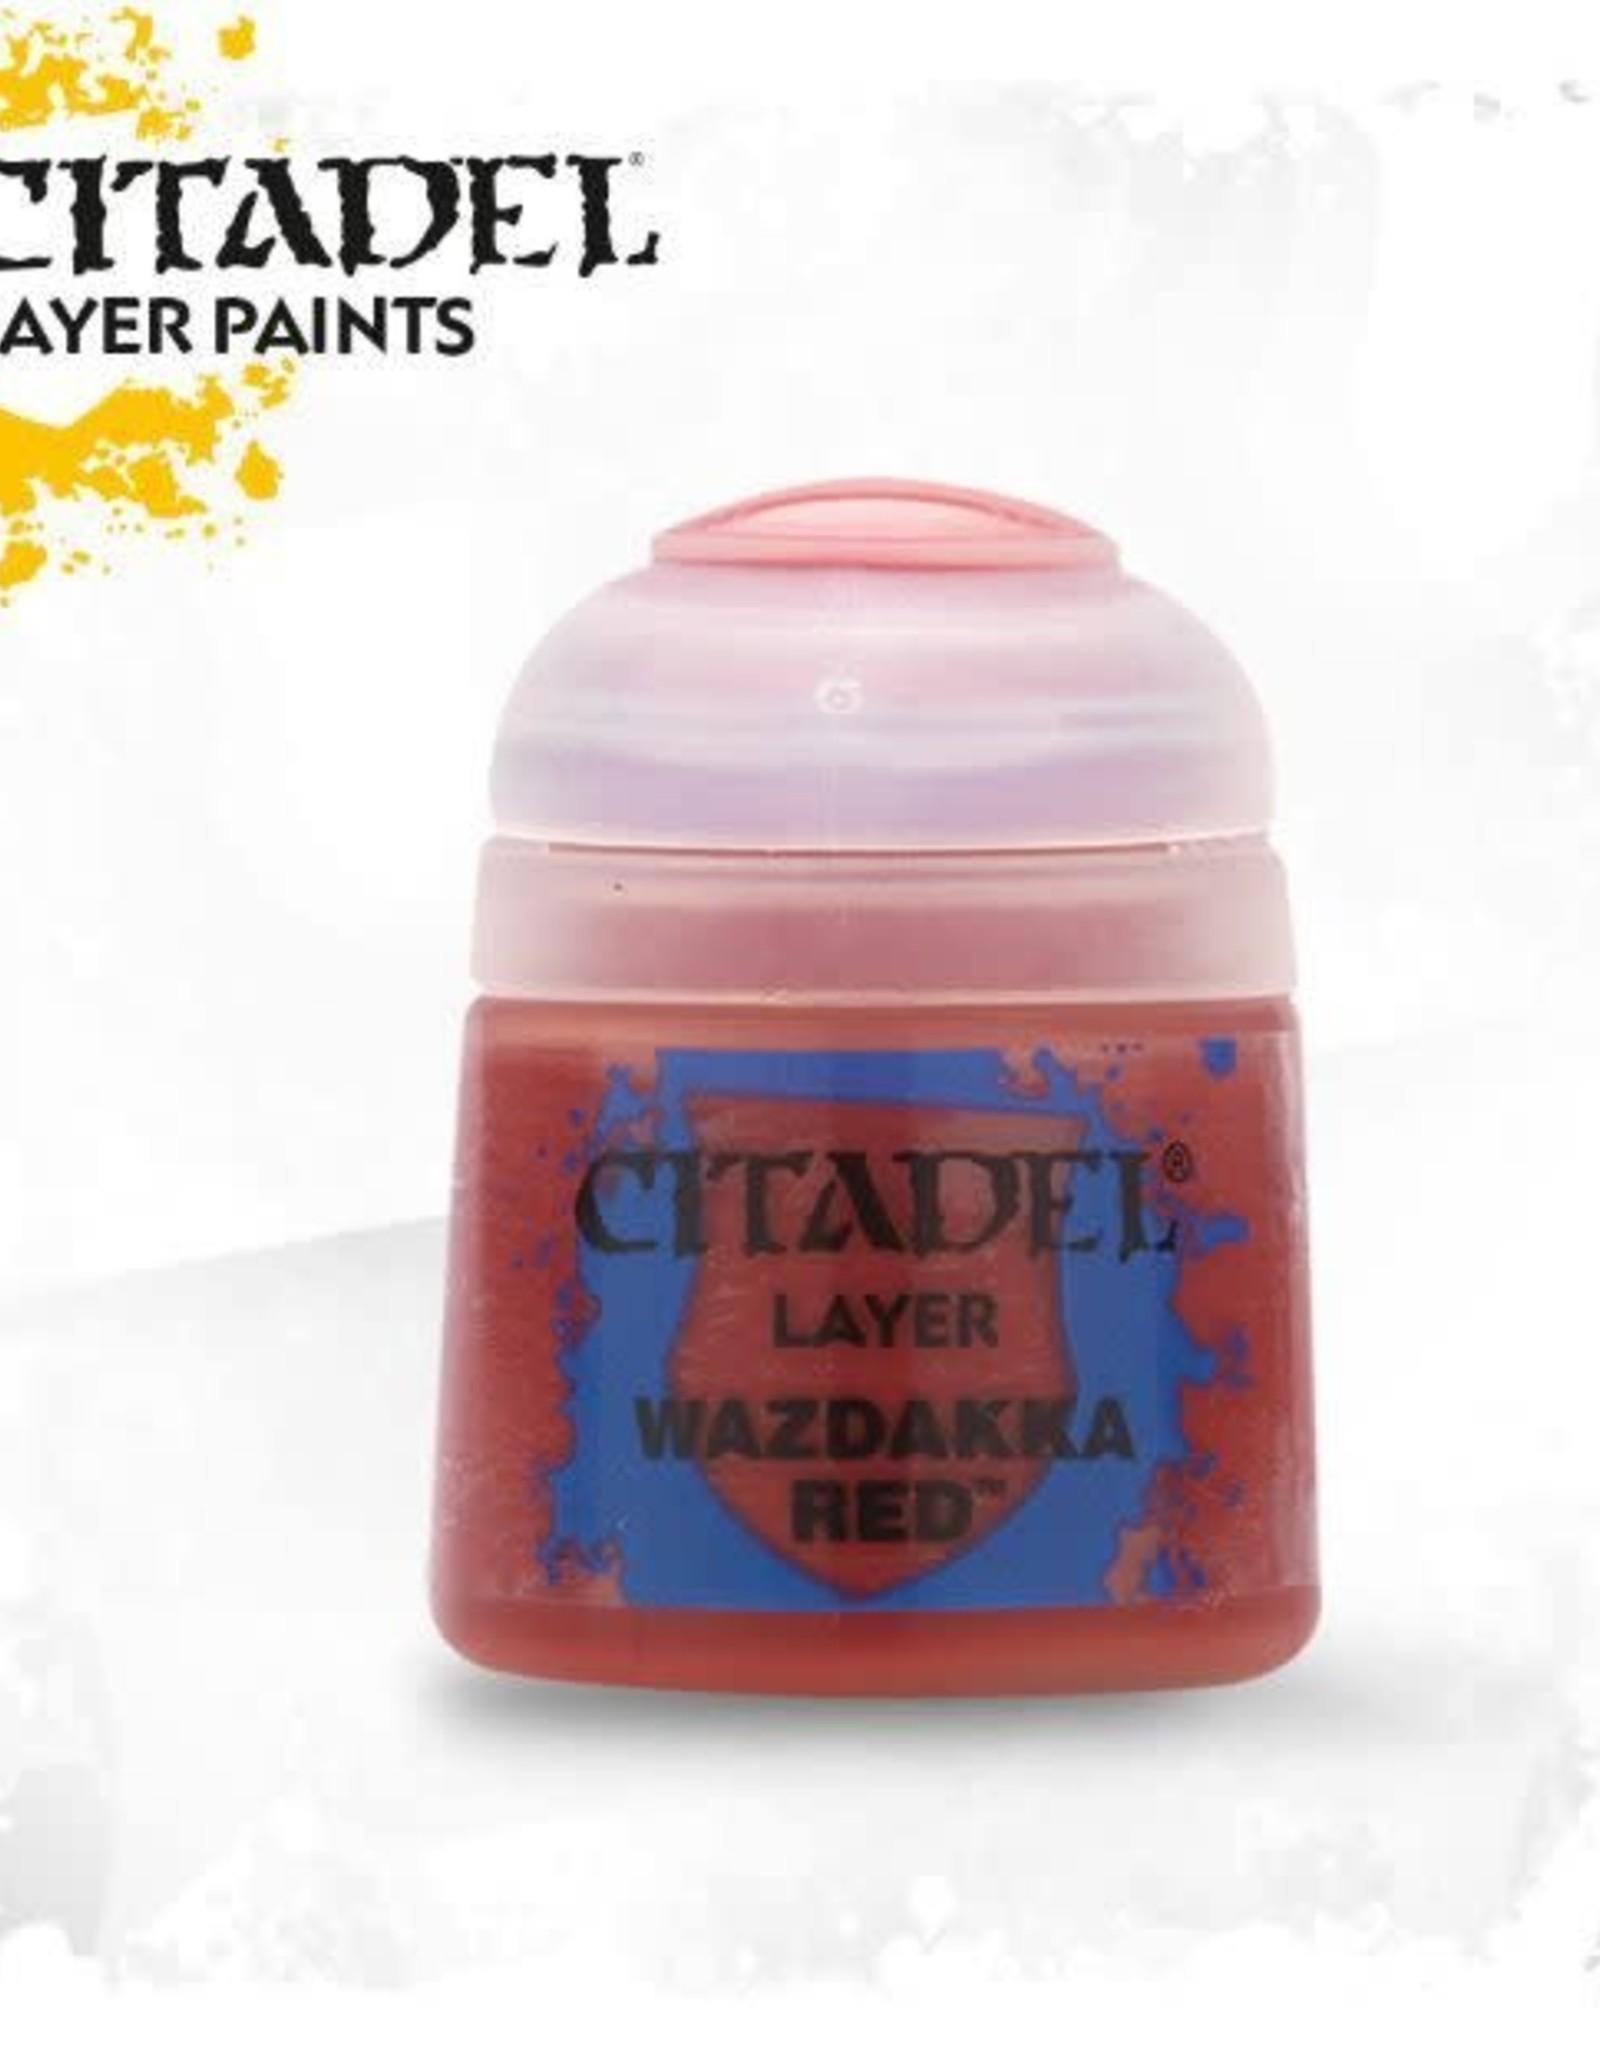 Games Workshop Citadel Paint: Layer - Wazdakka Red